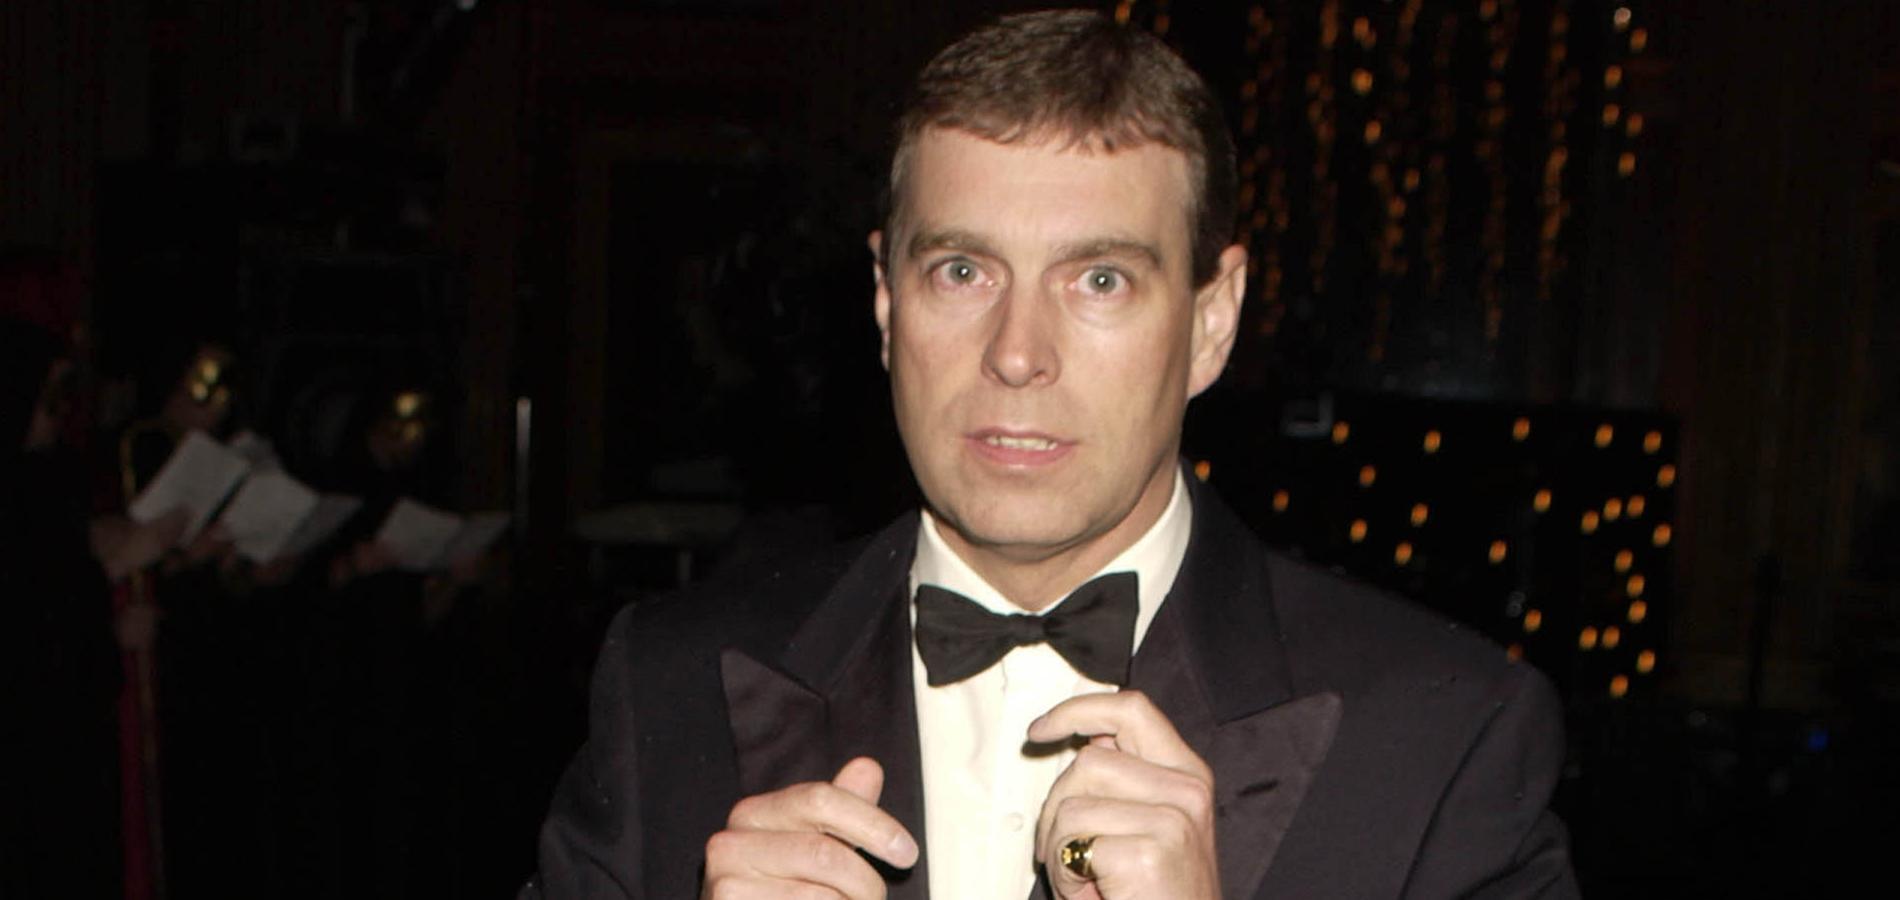 Ghislaine Maxwell arrêtée, le prince Andrew va-t-il tomber ?